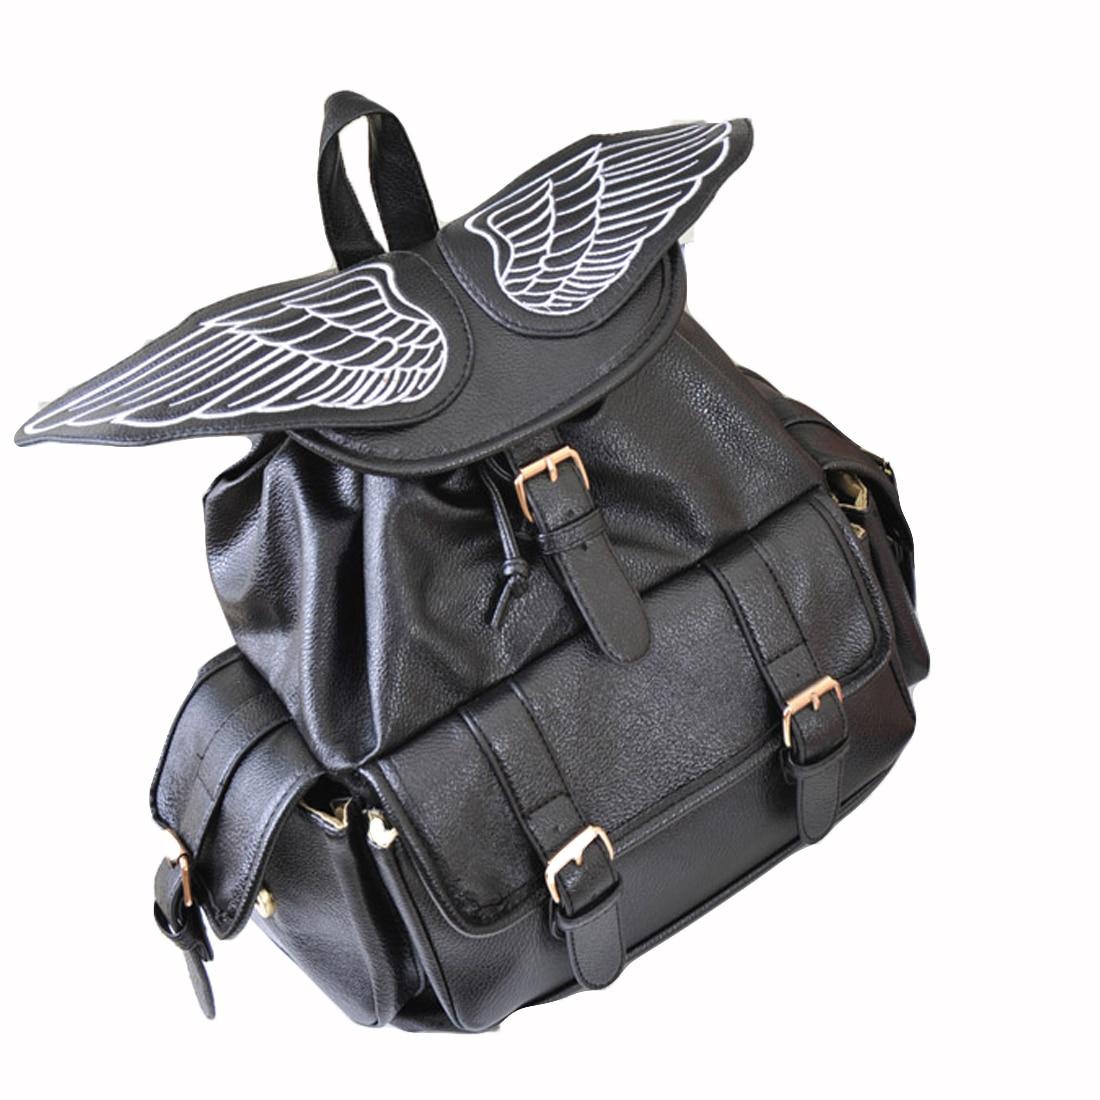 ФОТО YEJIA FASHION Angel Wings Black Backpack Large Capacity Casual School Bag PU Leather Travel Street Back Bags Satchel